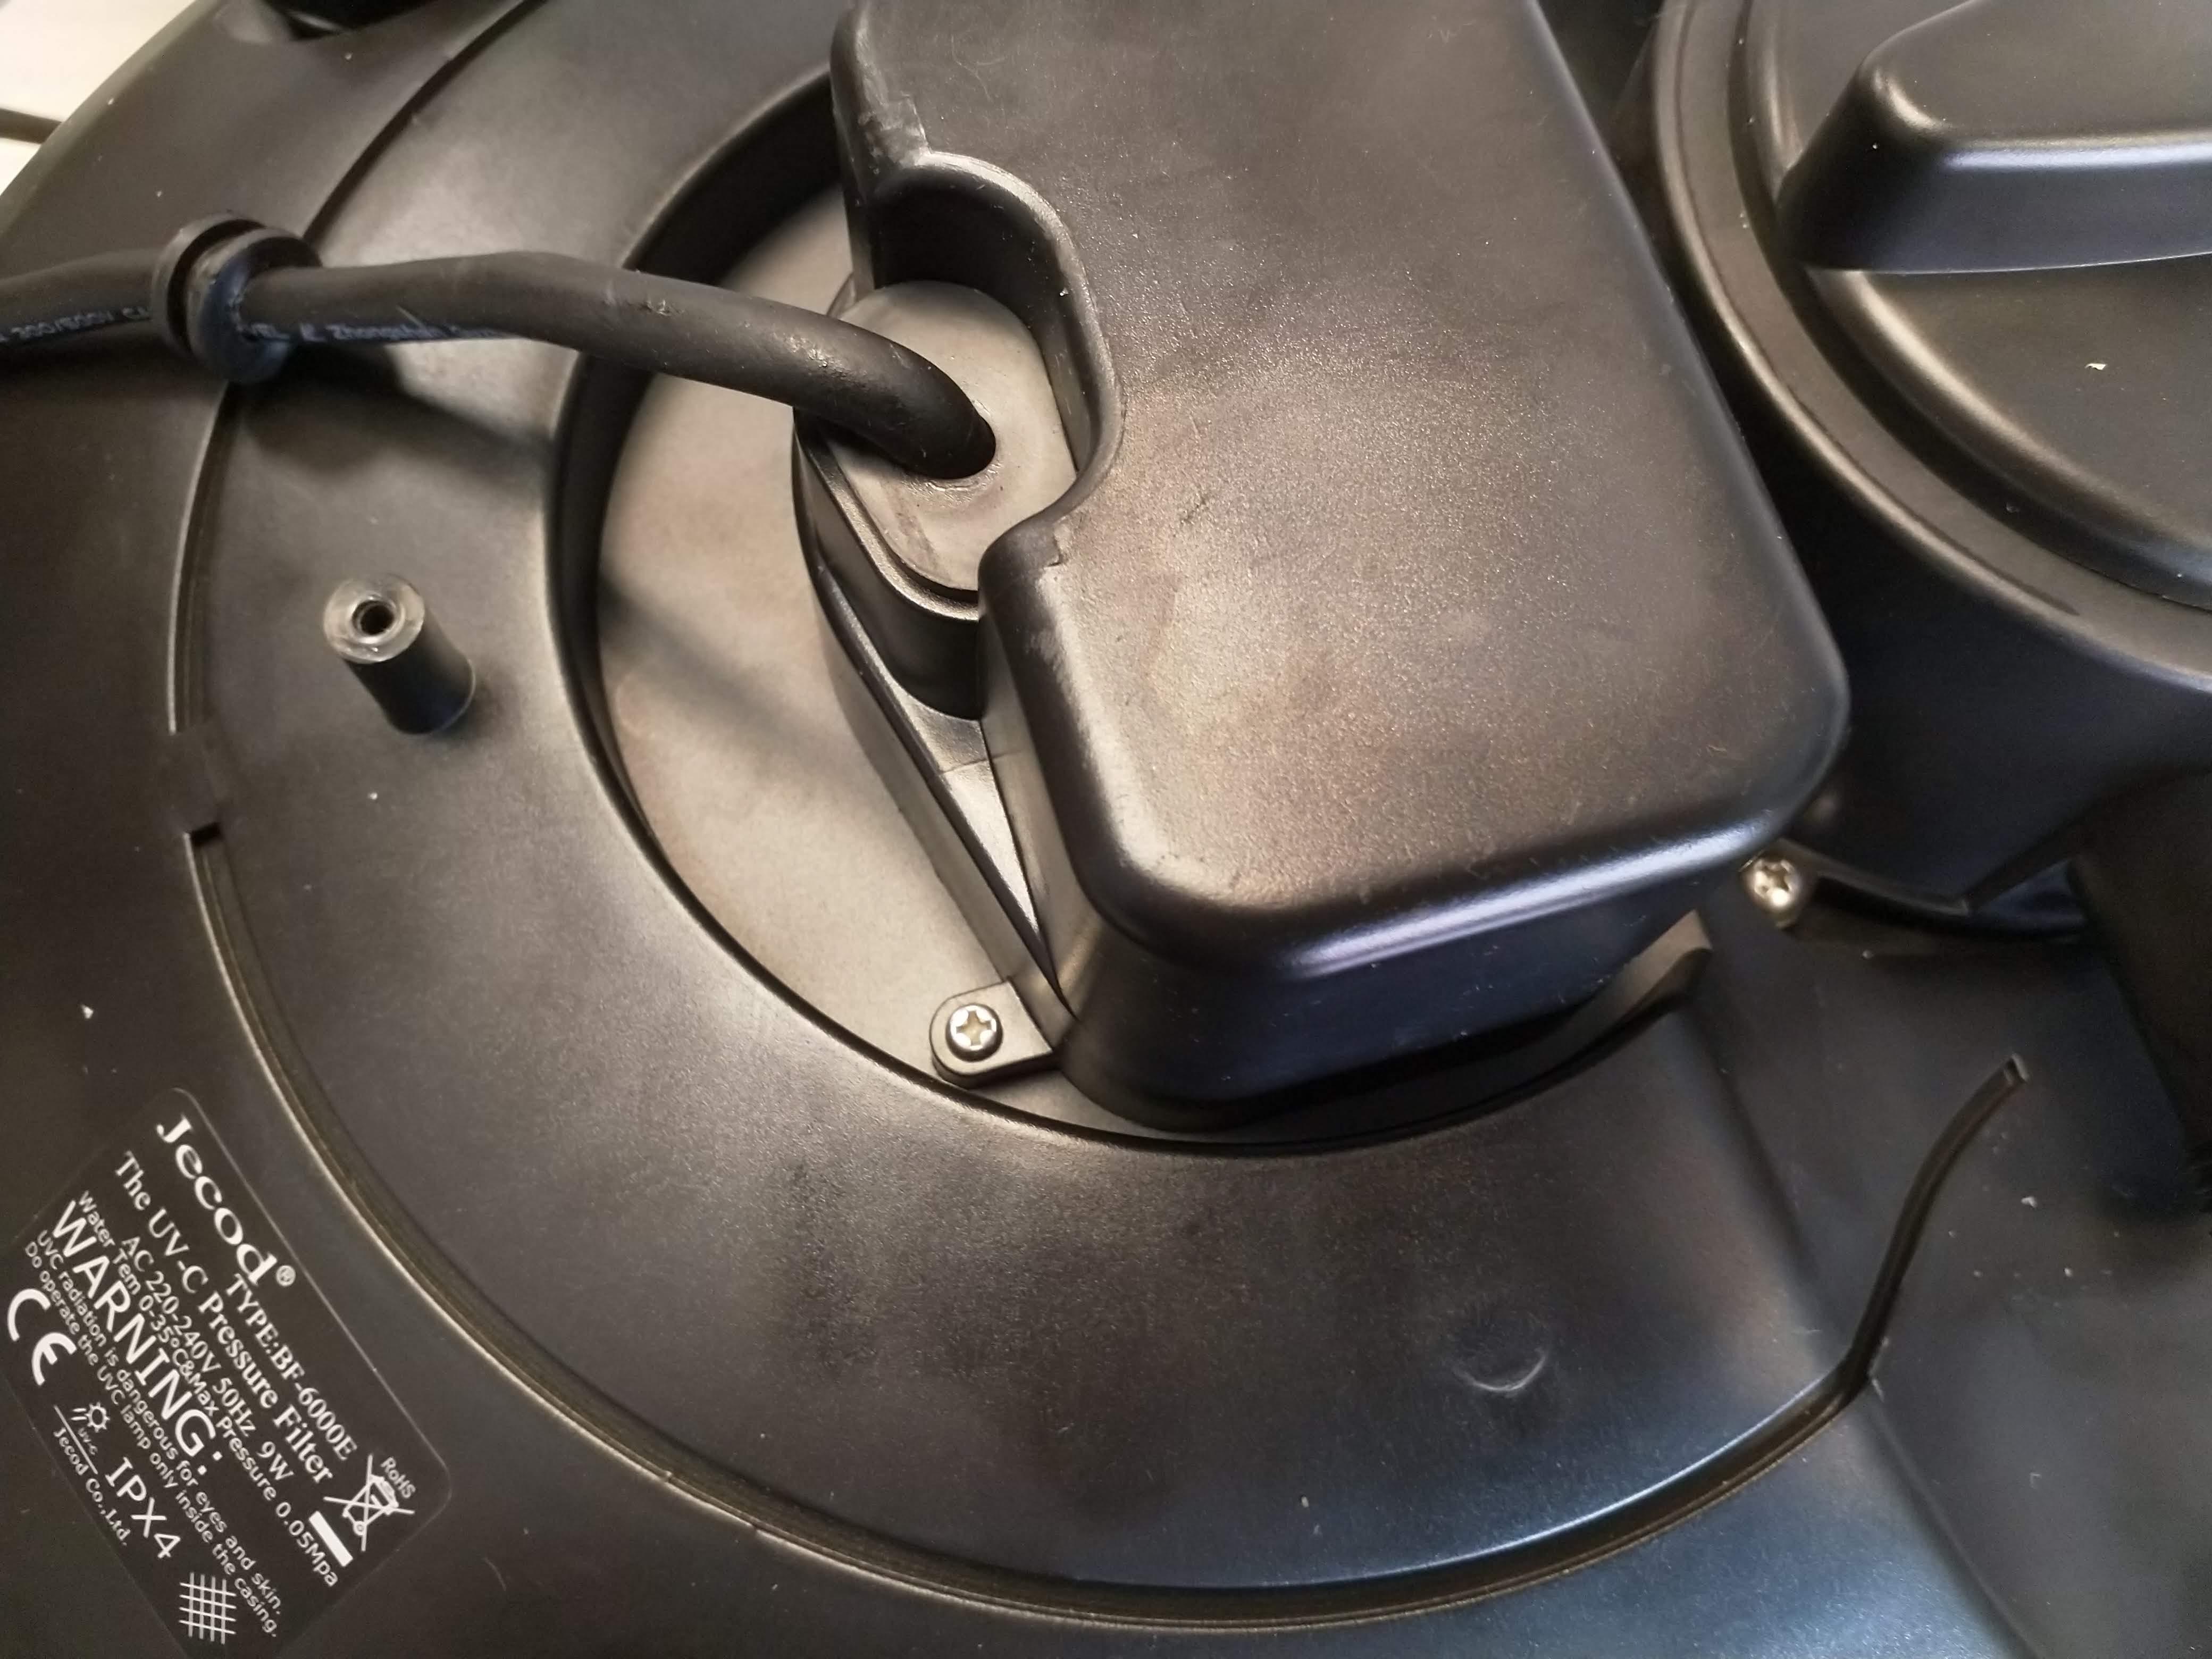 Pondkraft Pressurised Filter - Replacing the Bulb Step 2